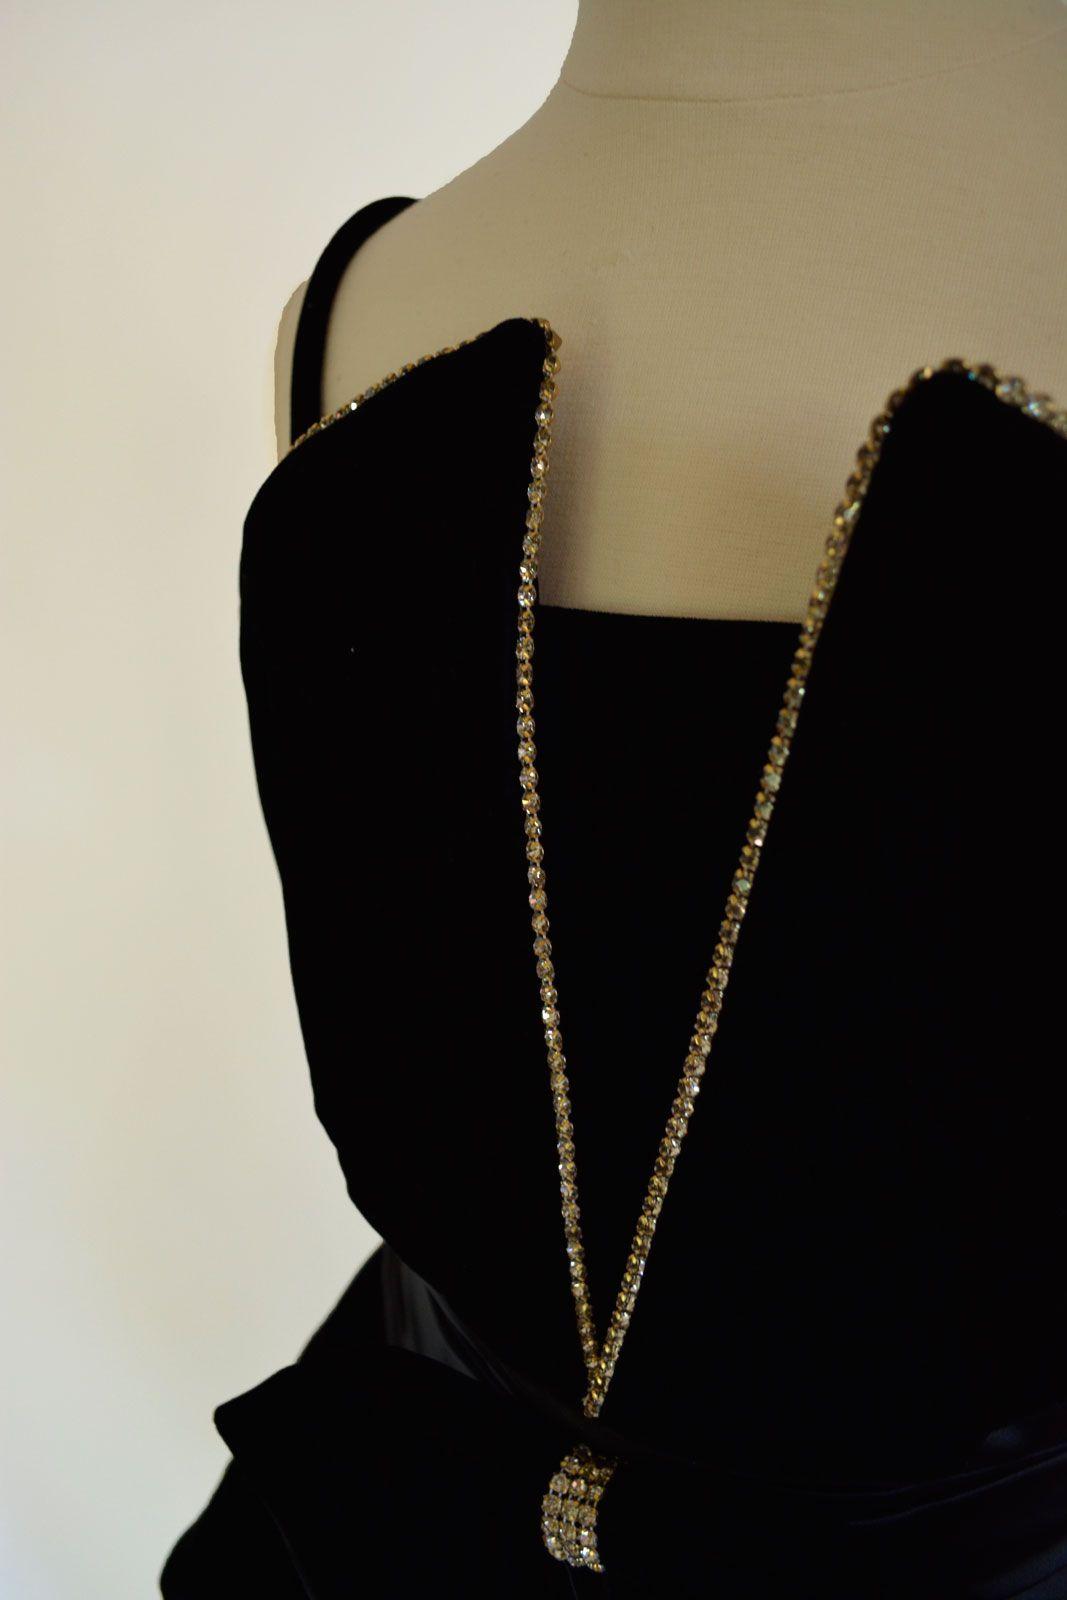 Vintage S Velvet Peplum Dress With Wonderful